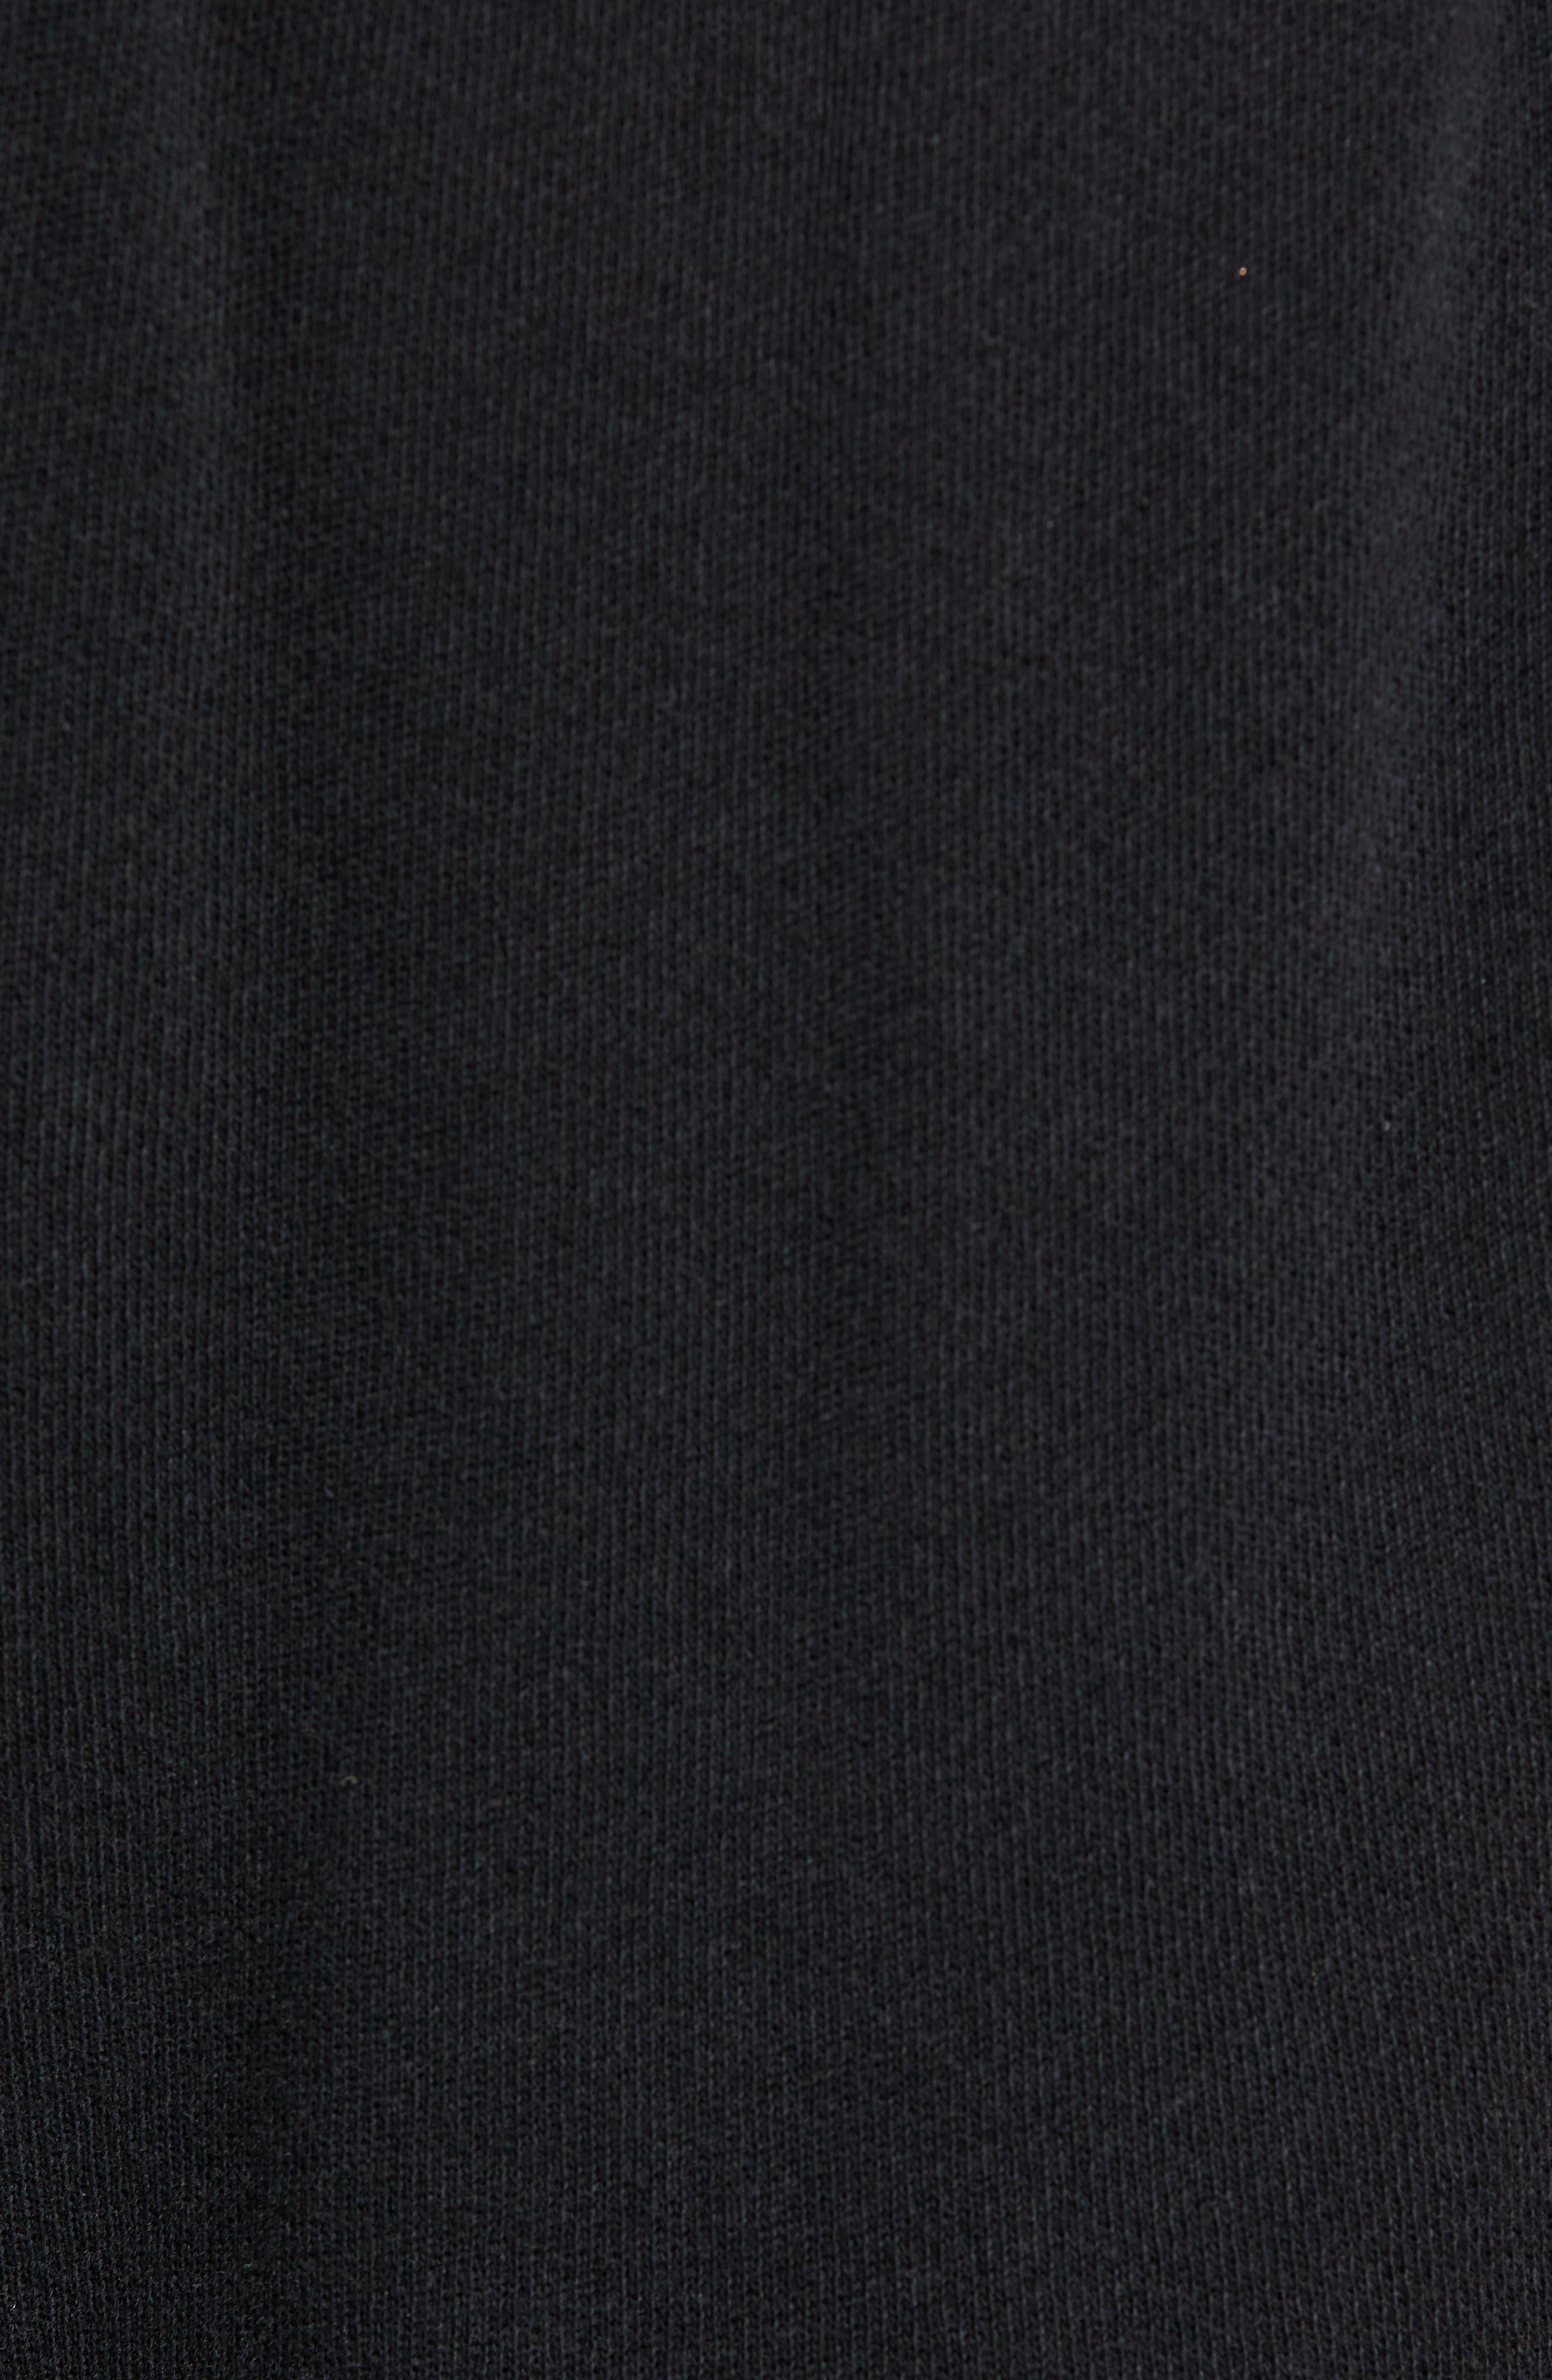 Slim Fit Sweatpants,                             Alternate thumbnail 5, color,                             CHARCOAL